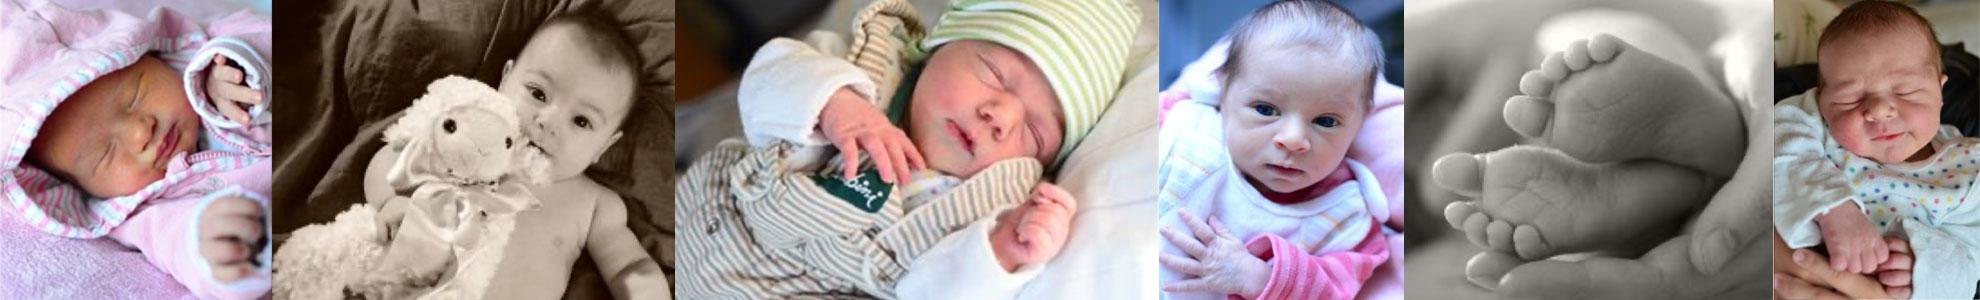 Babys fotografieren | Heiderose M. Kay, Fotografie-2